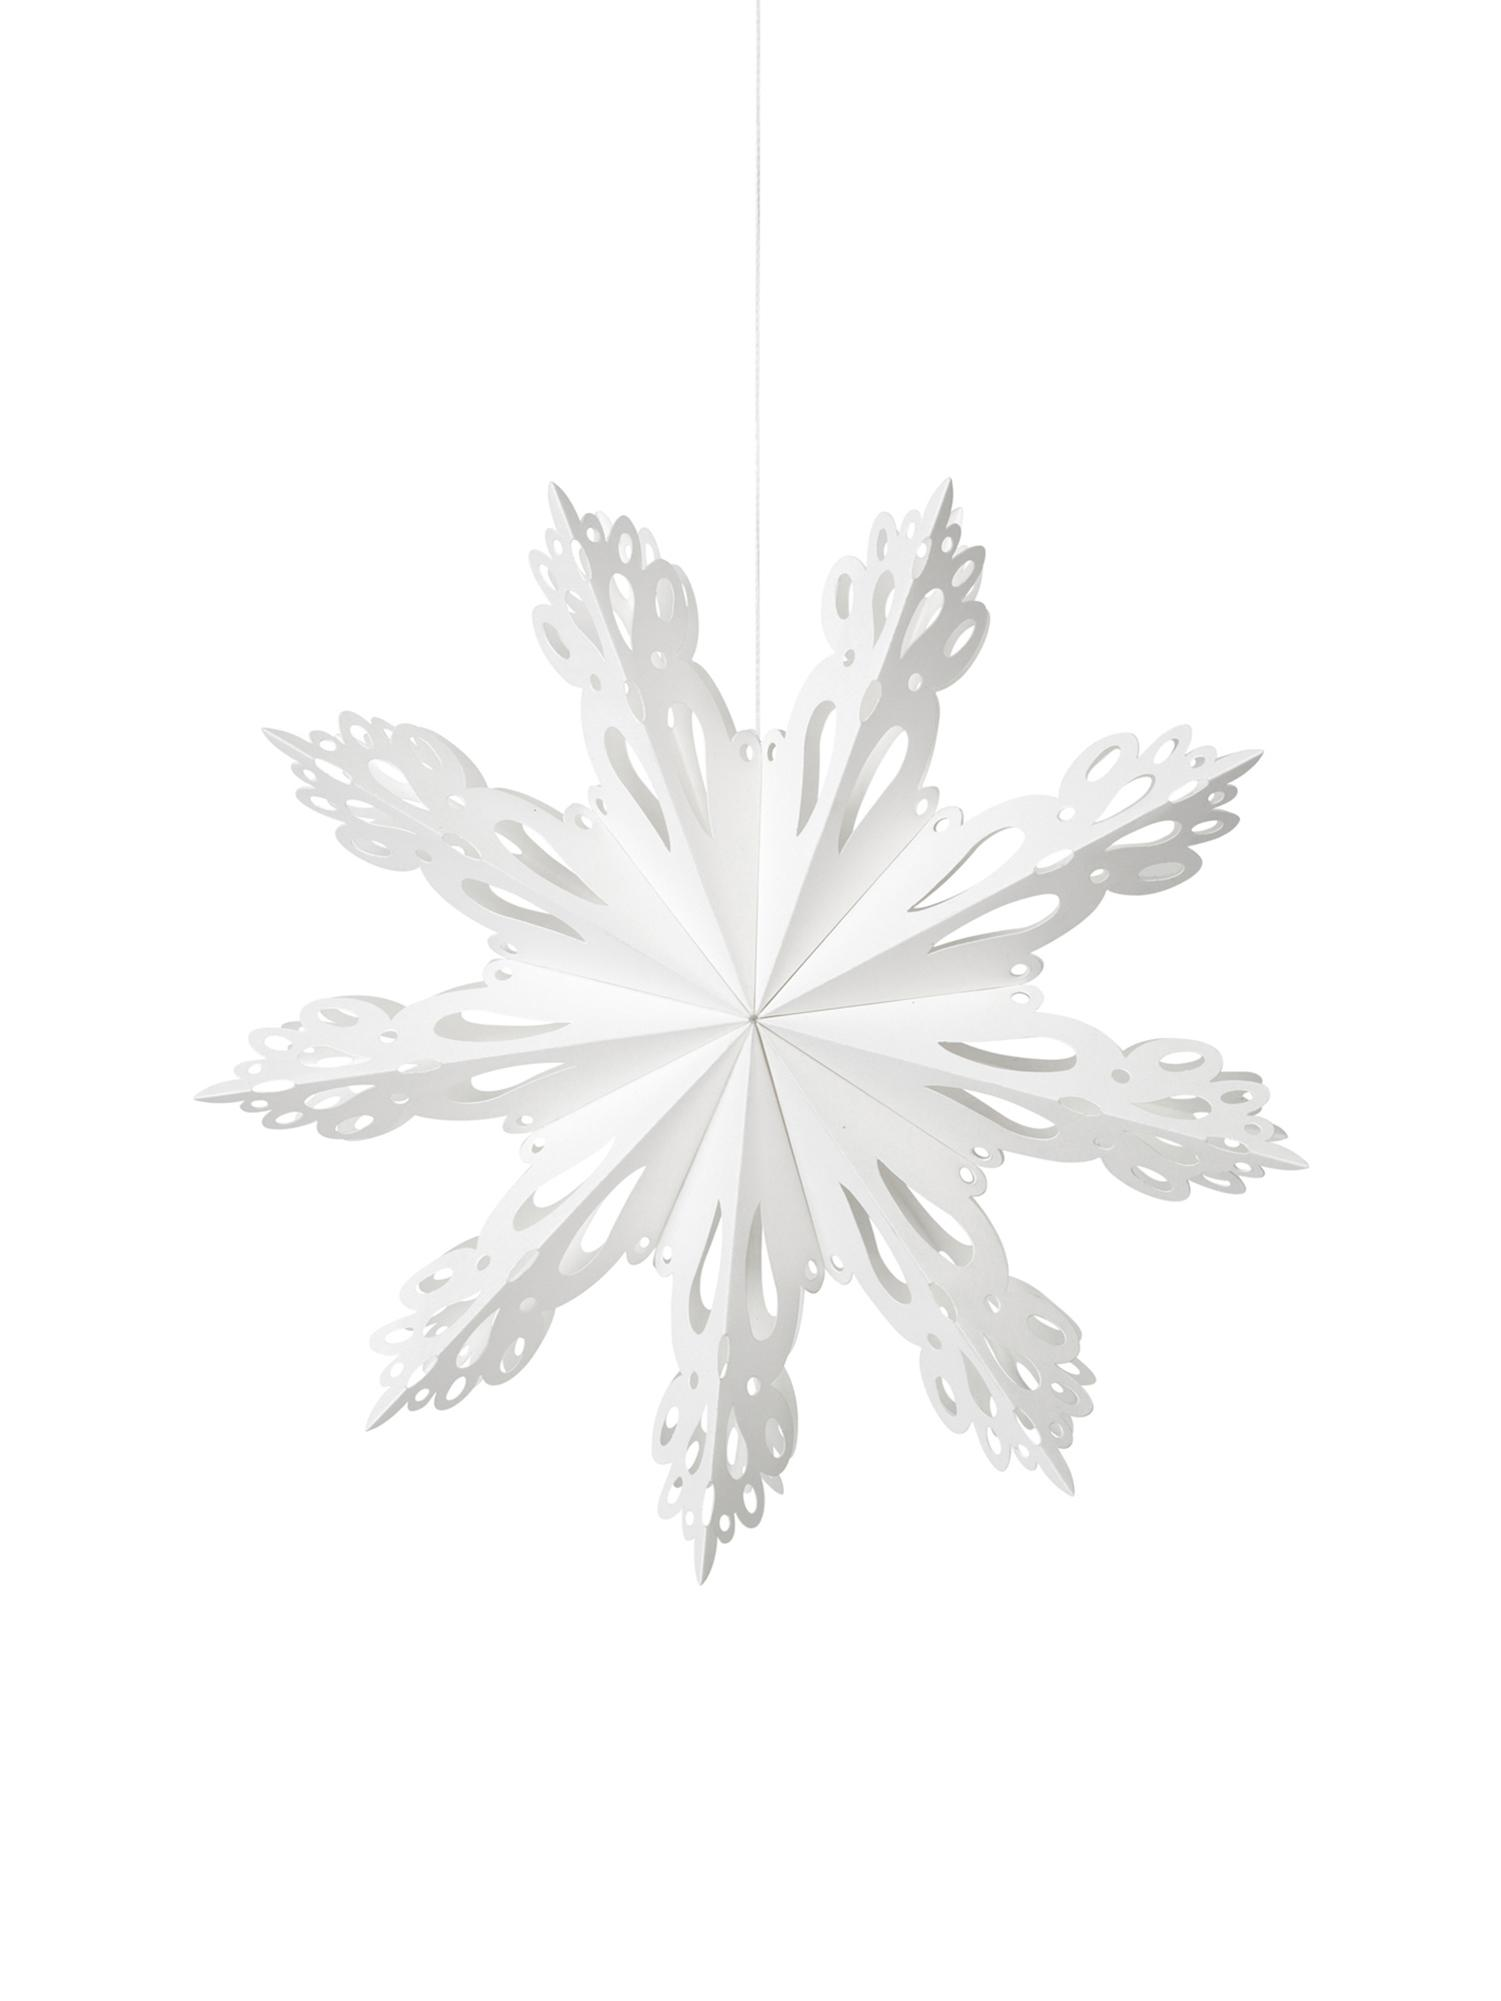 Adorno navideño XLSnowflake, Papel, Blanco, Ø 30 cm